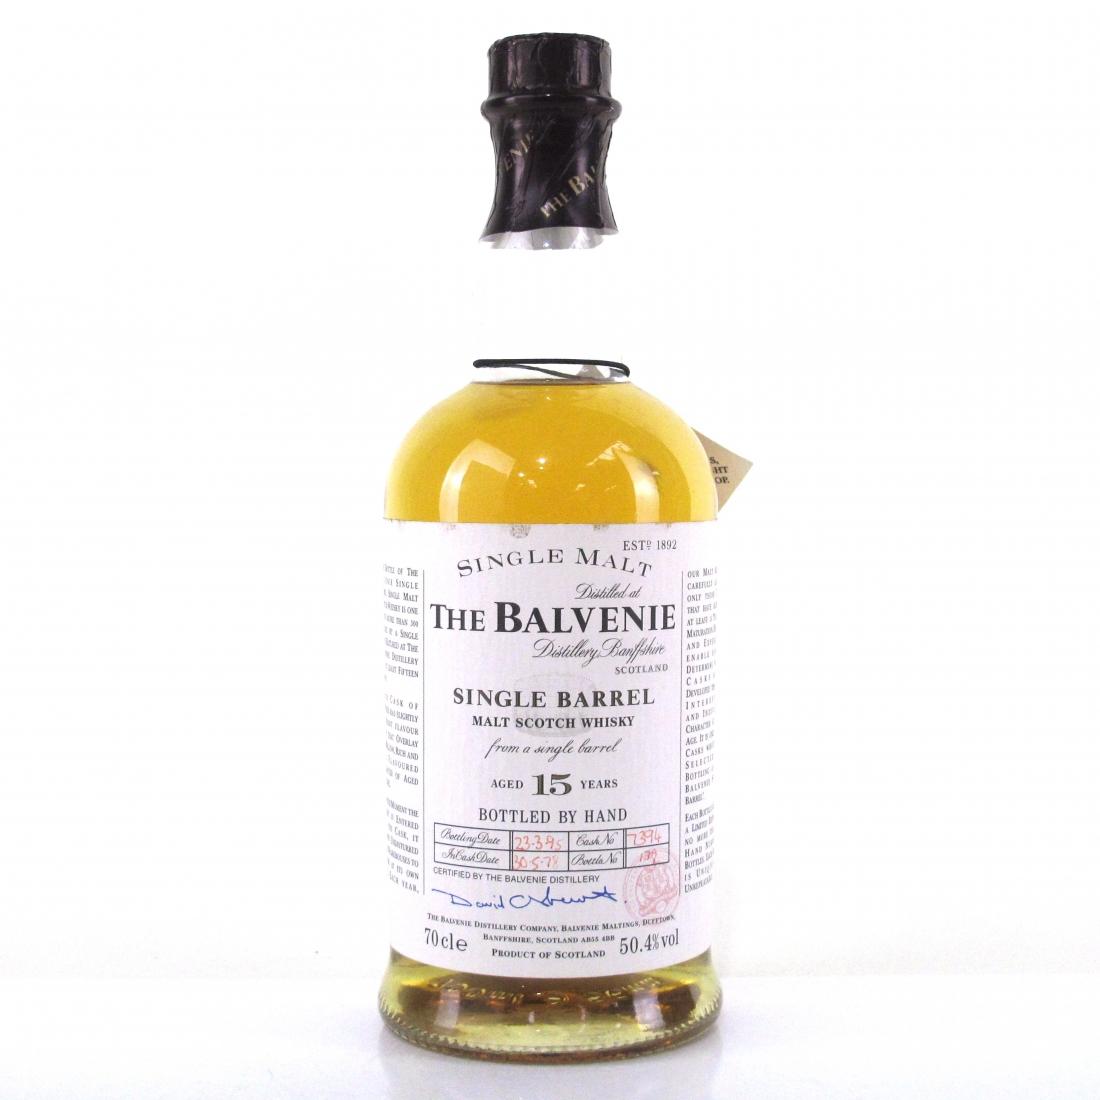 Balvenie 1978 Single Barrel 15 Year Old